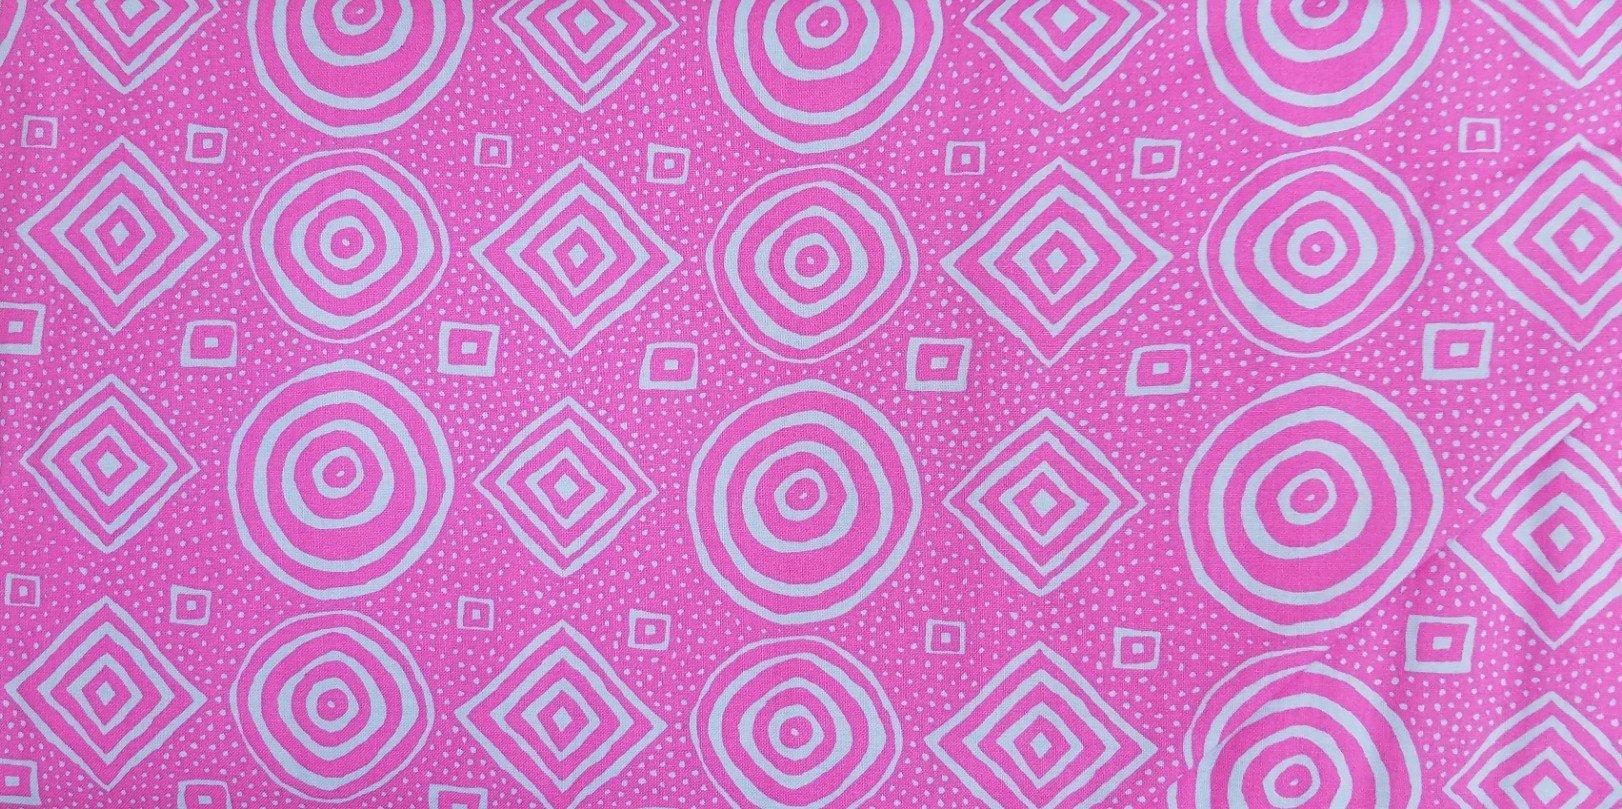 Brandon Mably - Spring 2018 - Good Vibrations - Pink